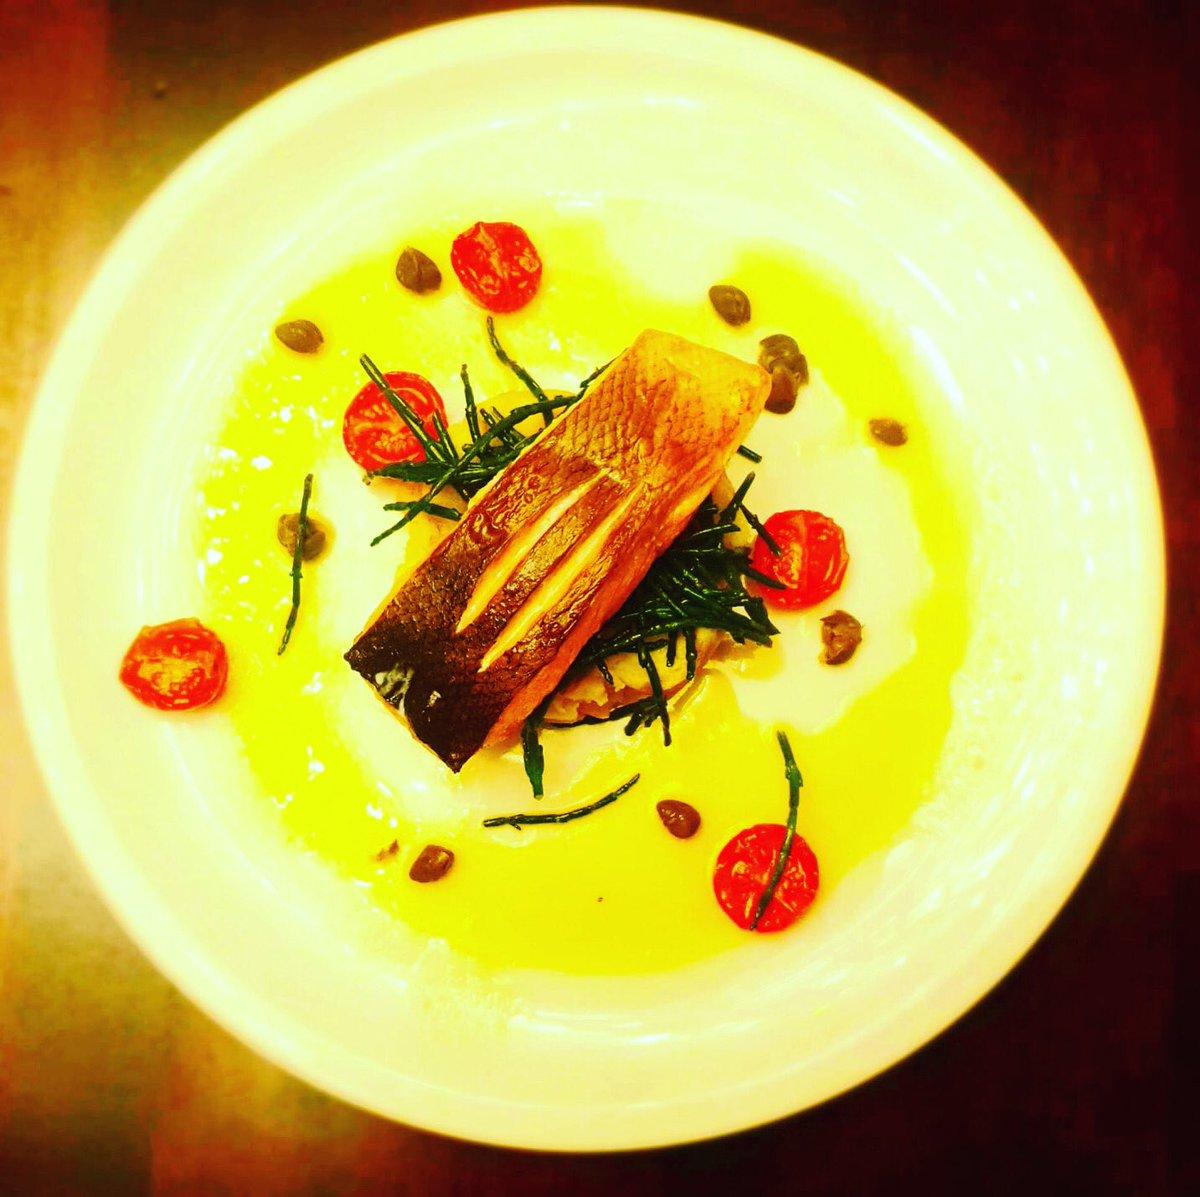 On tonight. Pan fried Irish salmon, sauteed samphire, crushed potatoes caper and oven roast tomato butter sauce #dublincitycentre #dublinonourdoorstep #Ourteam #chefgoals #chefteam #dublinfood #dublindining https://t.co/c81Nzy38rc